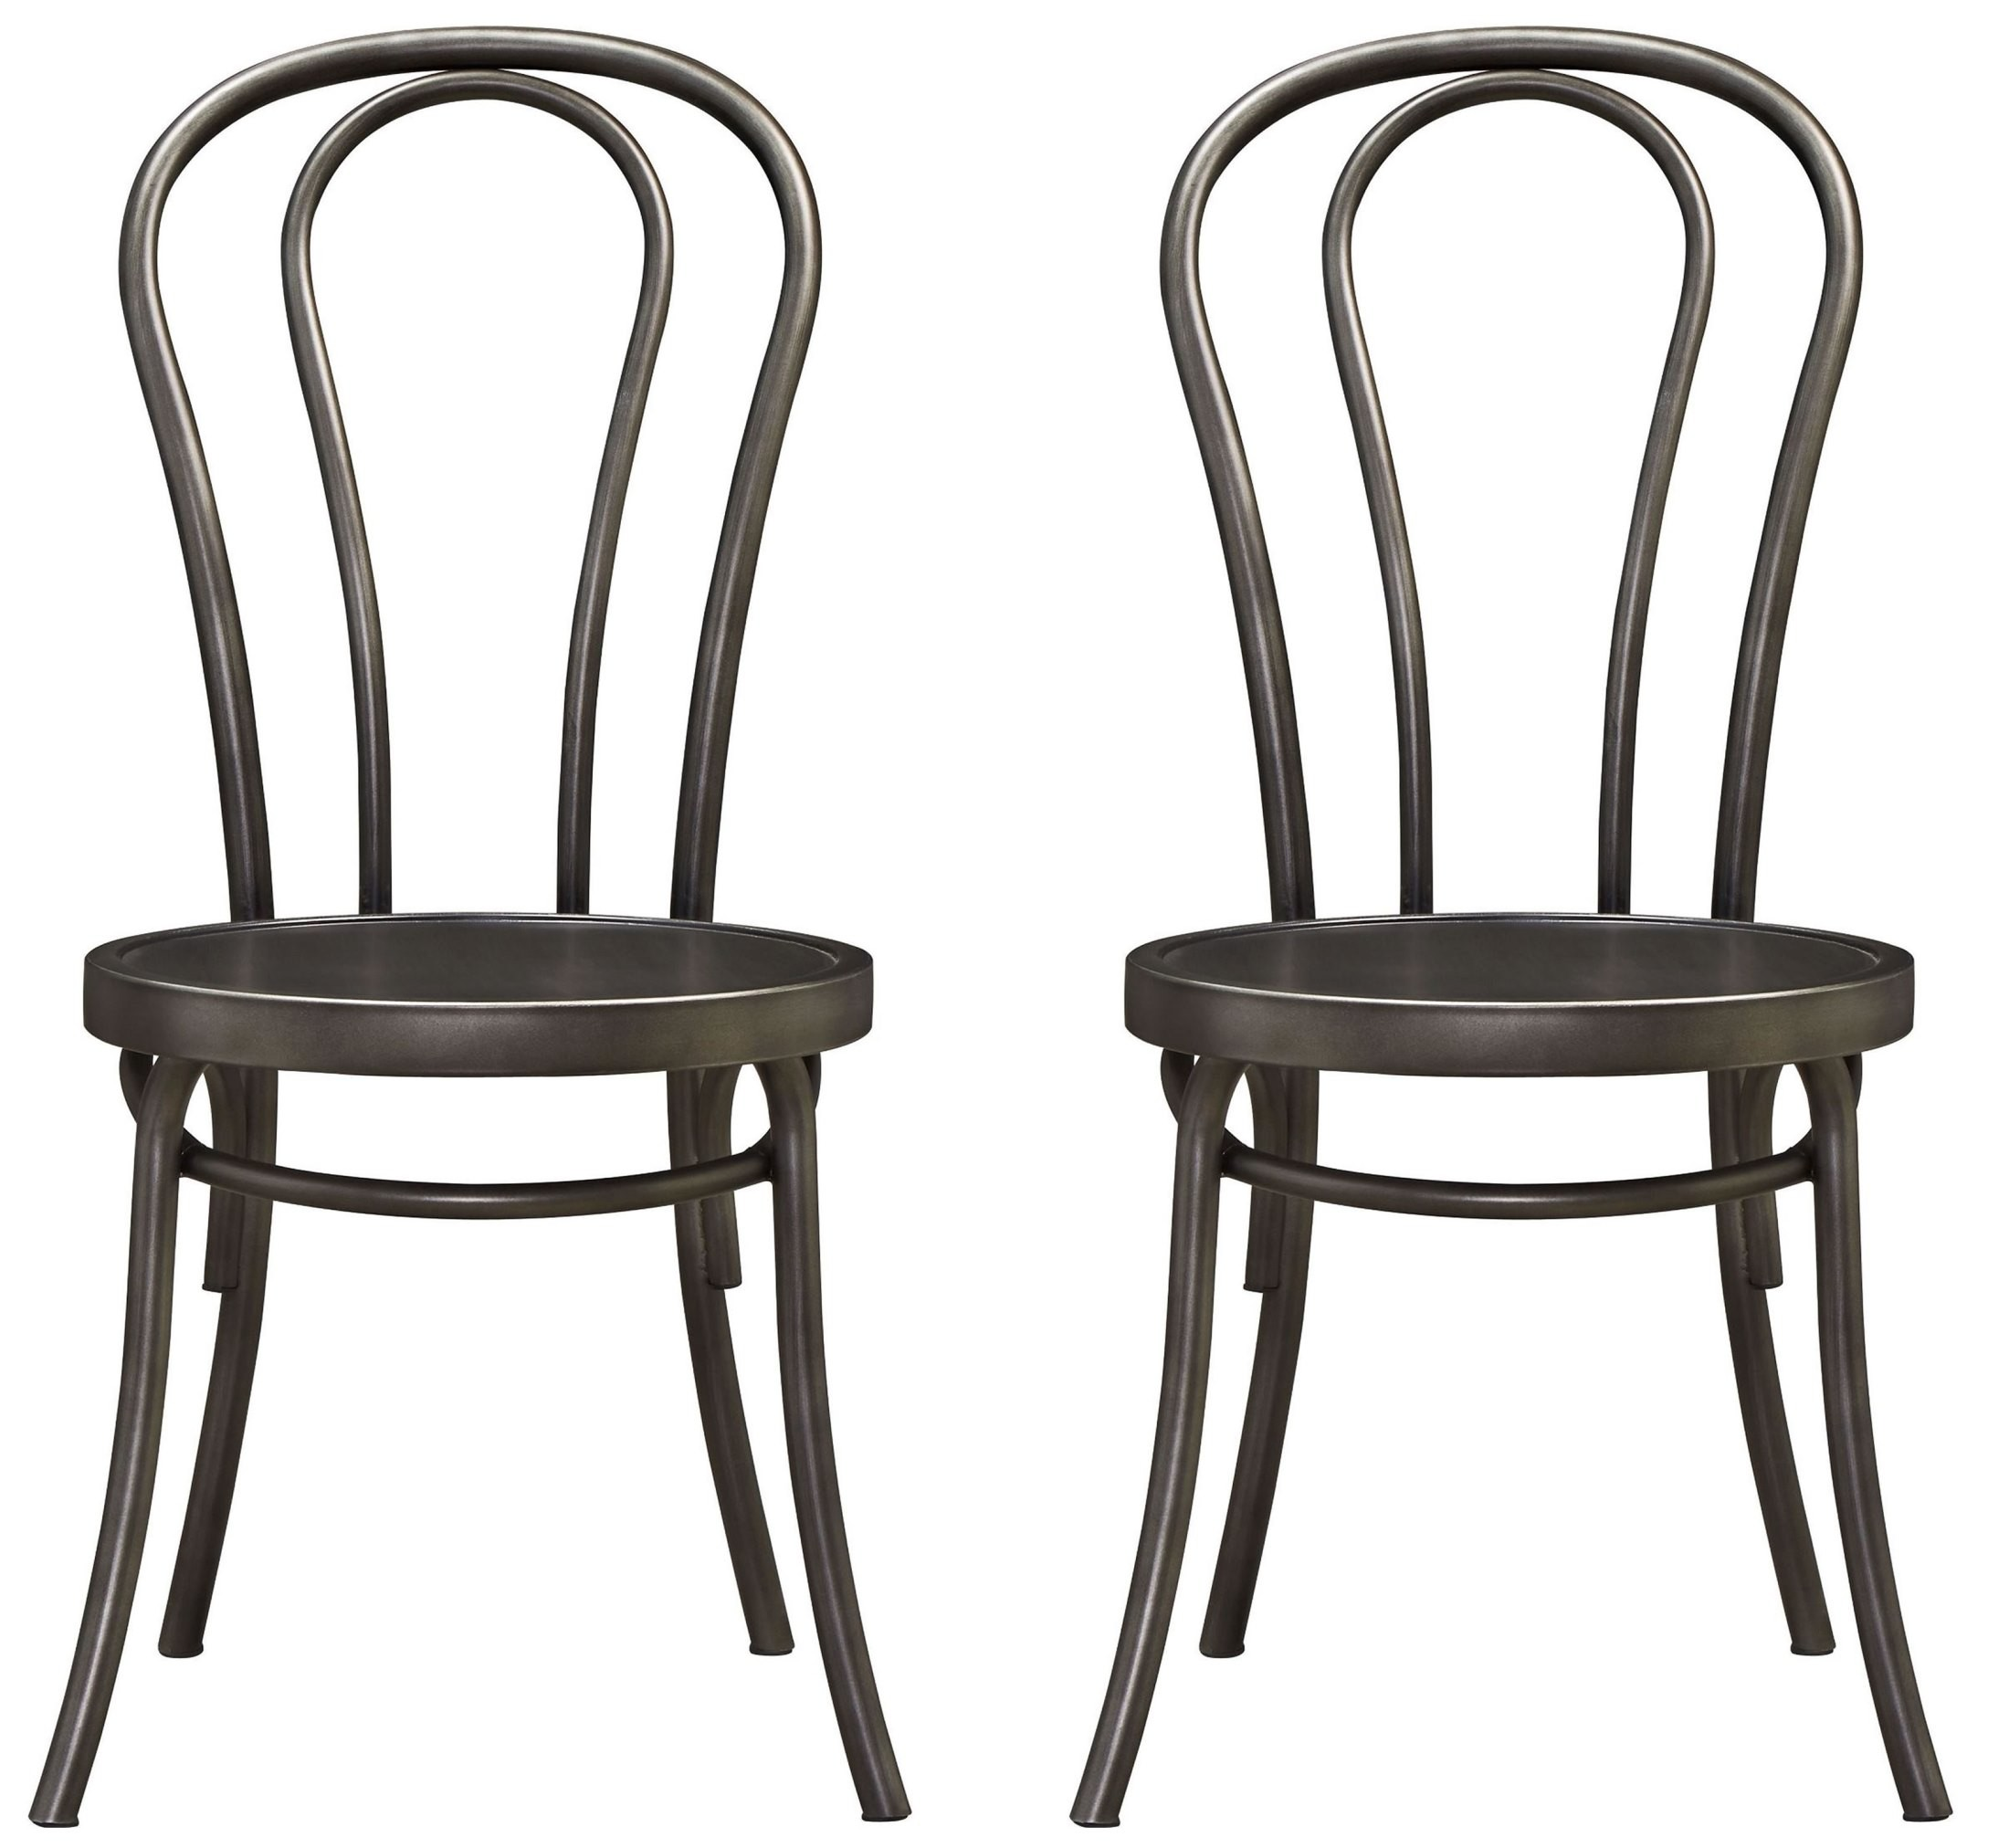 bistro chair set of 2 architecture modern idea u2022 rh purple echodigitalmedia co uk